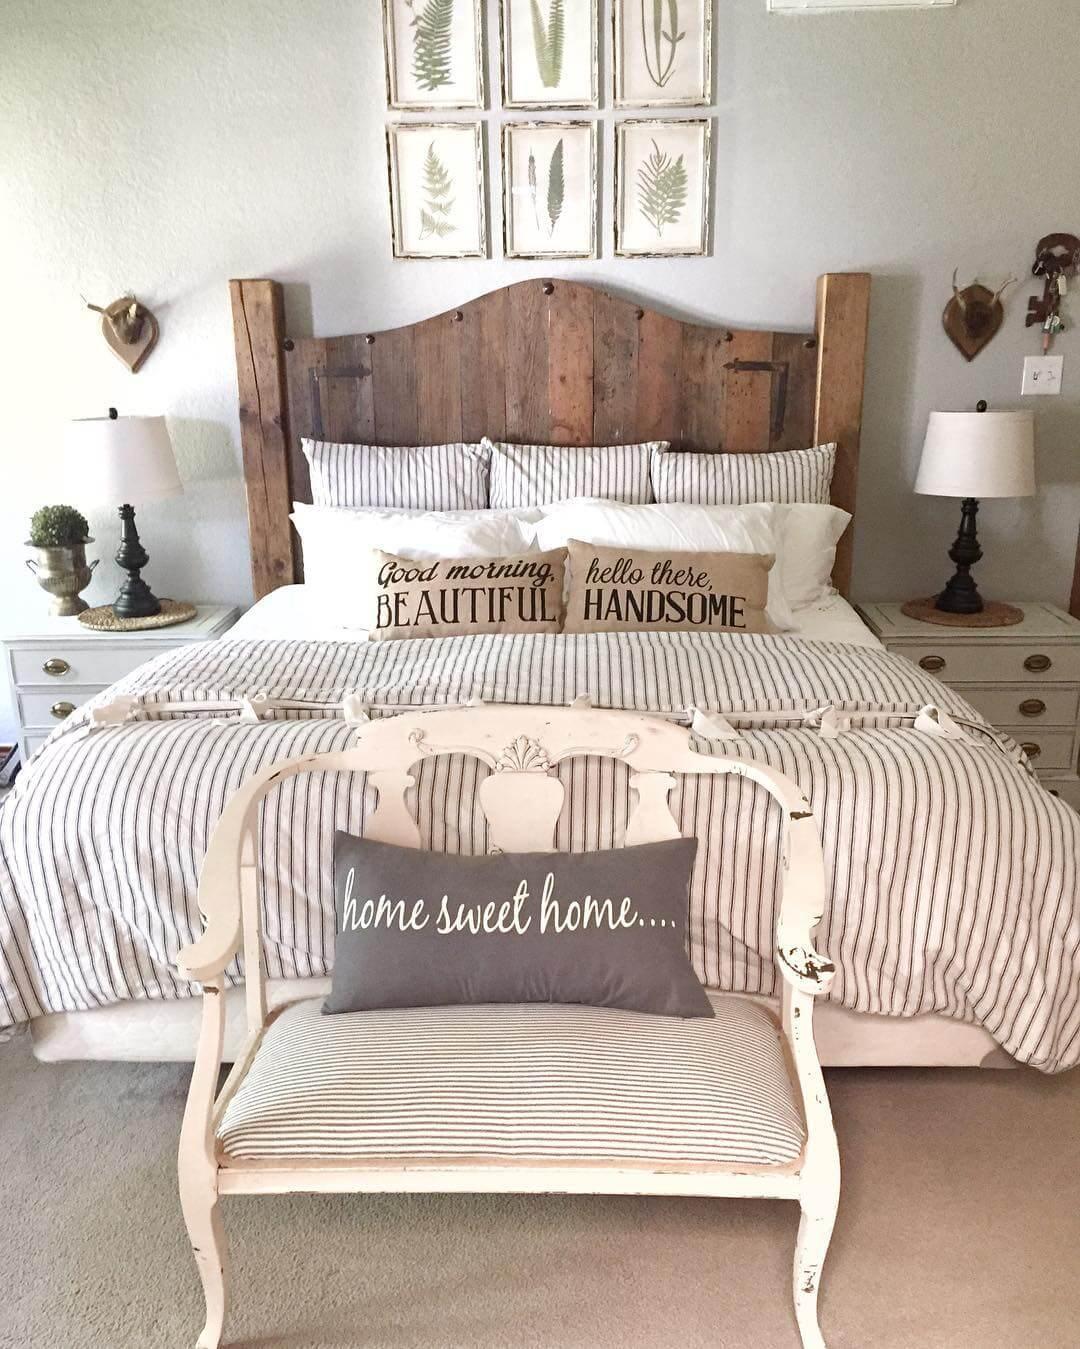 Homestead chic romantic bedroom decorating ideas on a budget LMBRIOR